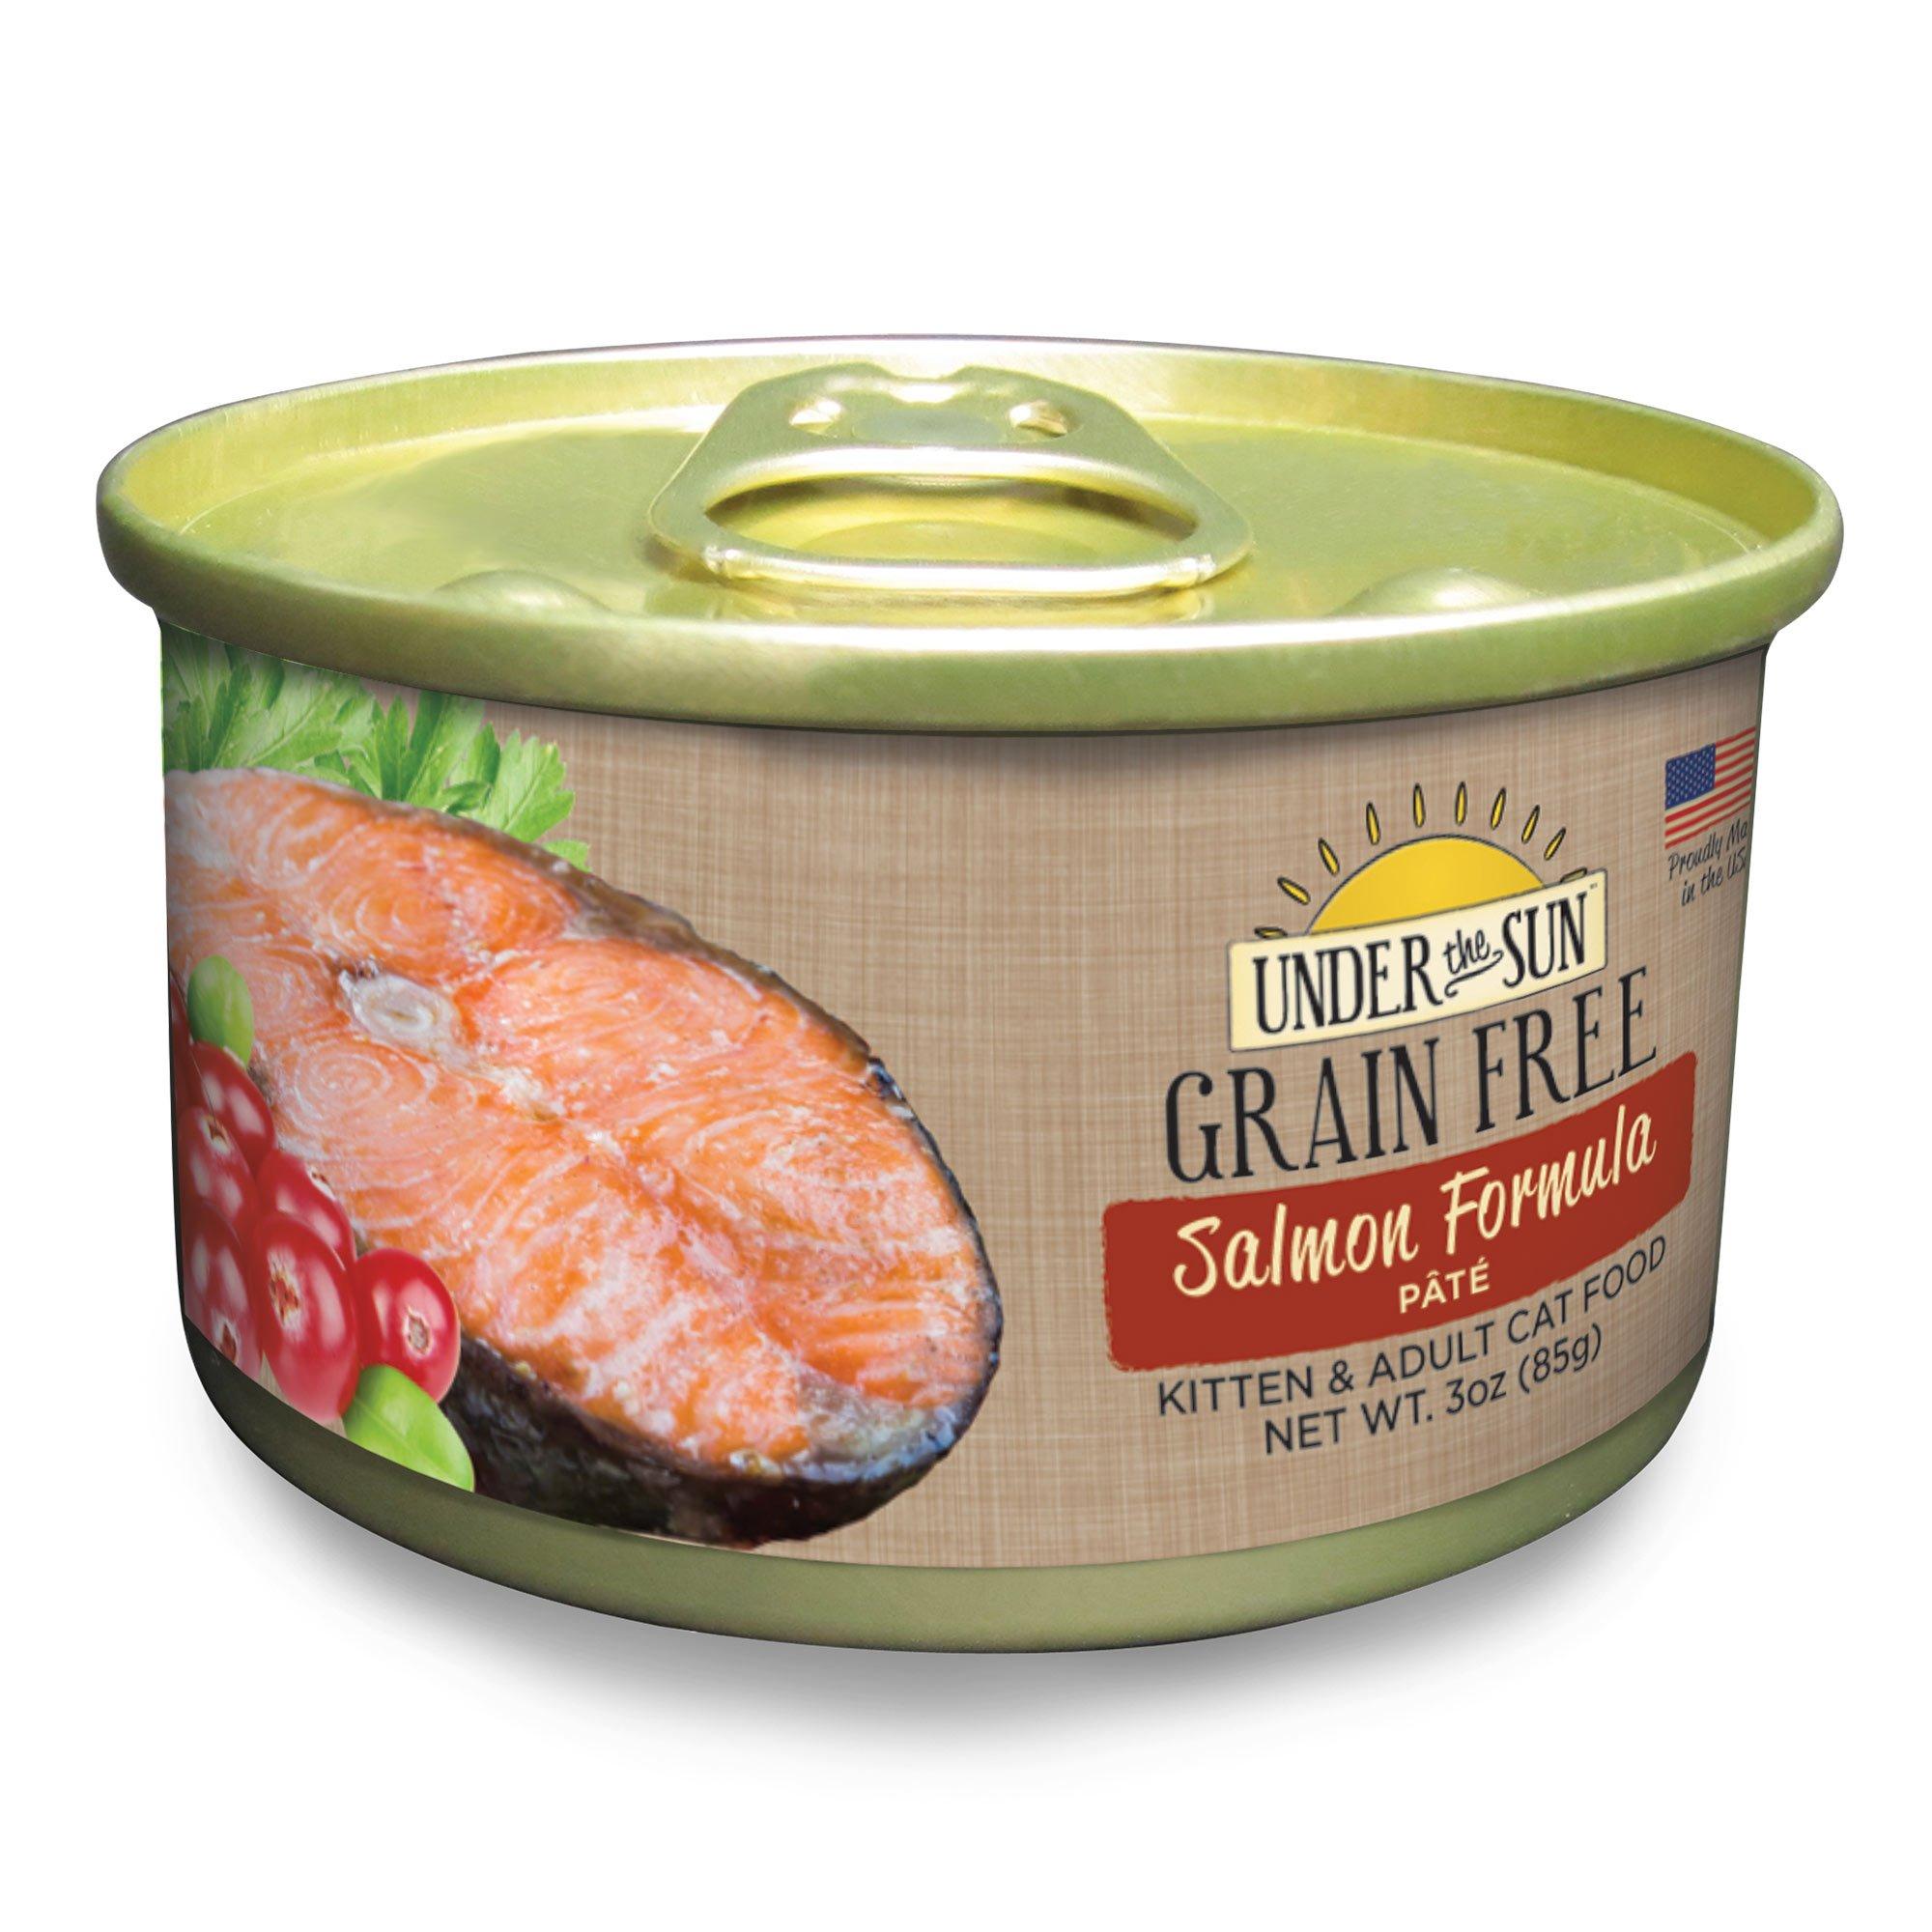 Under The Sun Grain Free Salmon Kitten & Adult Canned Cat Food